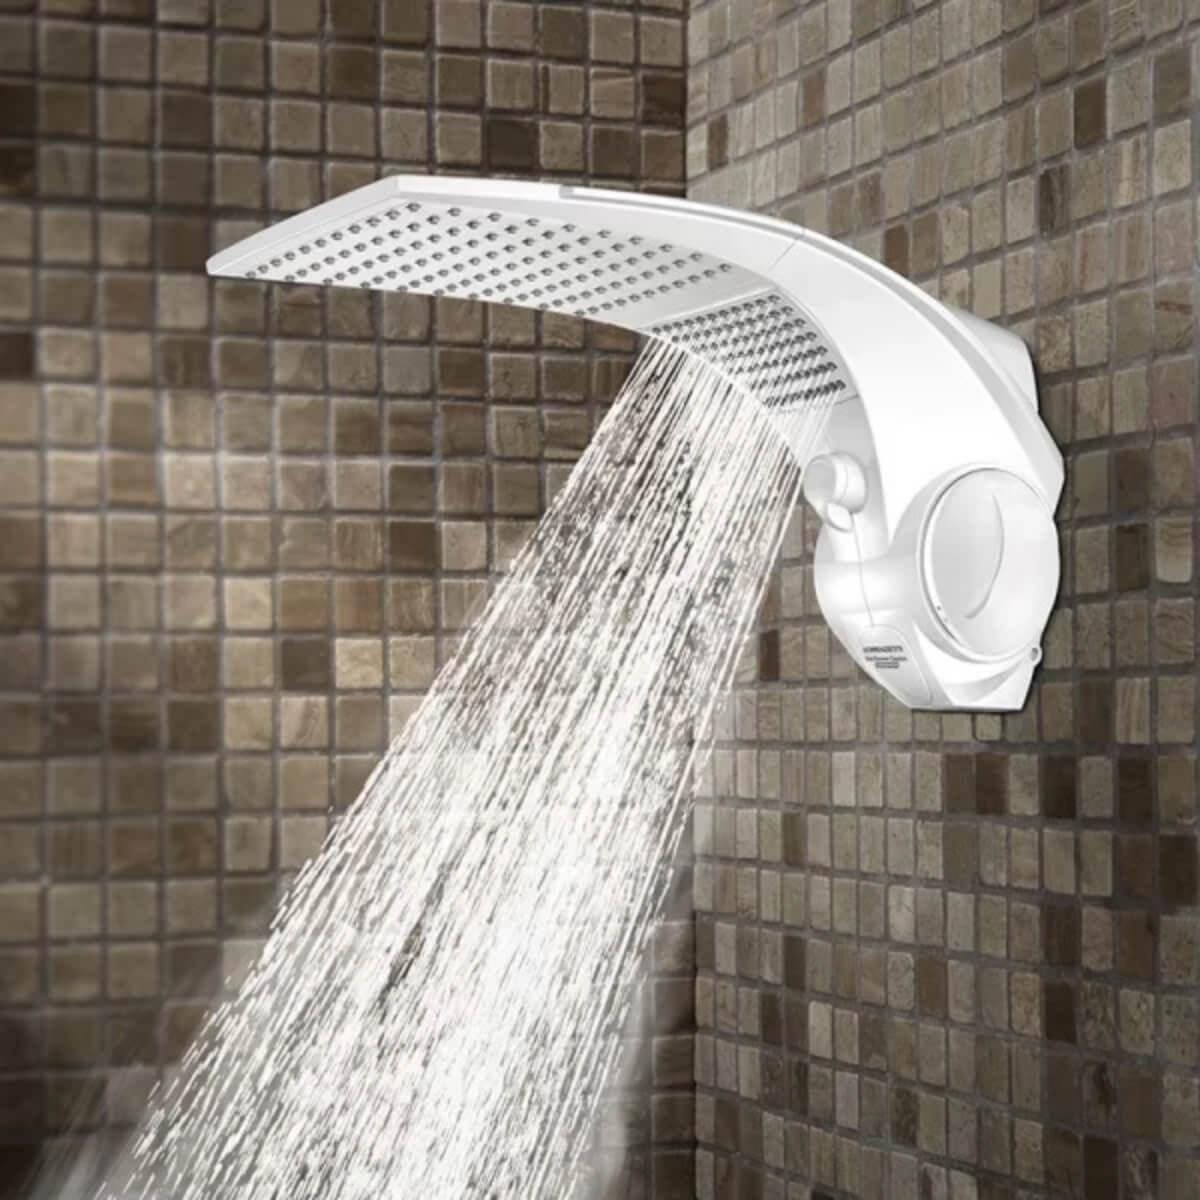 Chuveiro Lorenzetti Duo Shower Quadra Multitemperatura